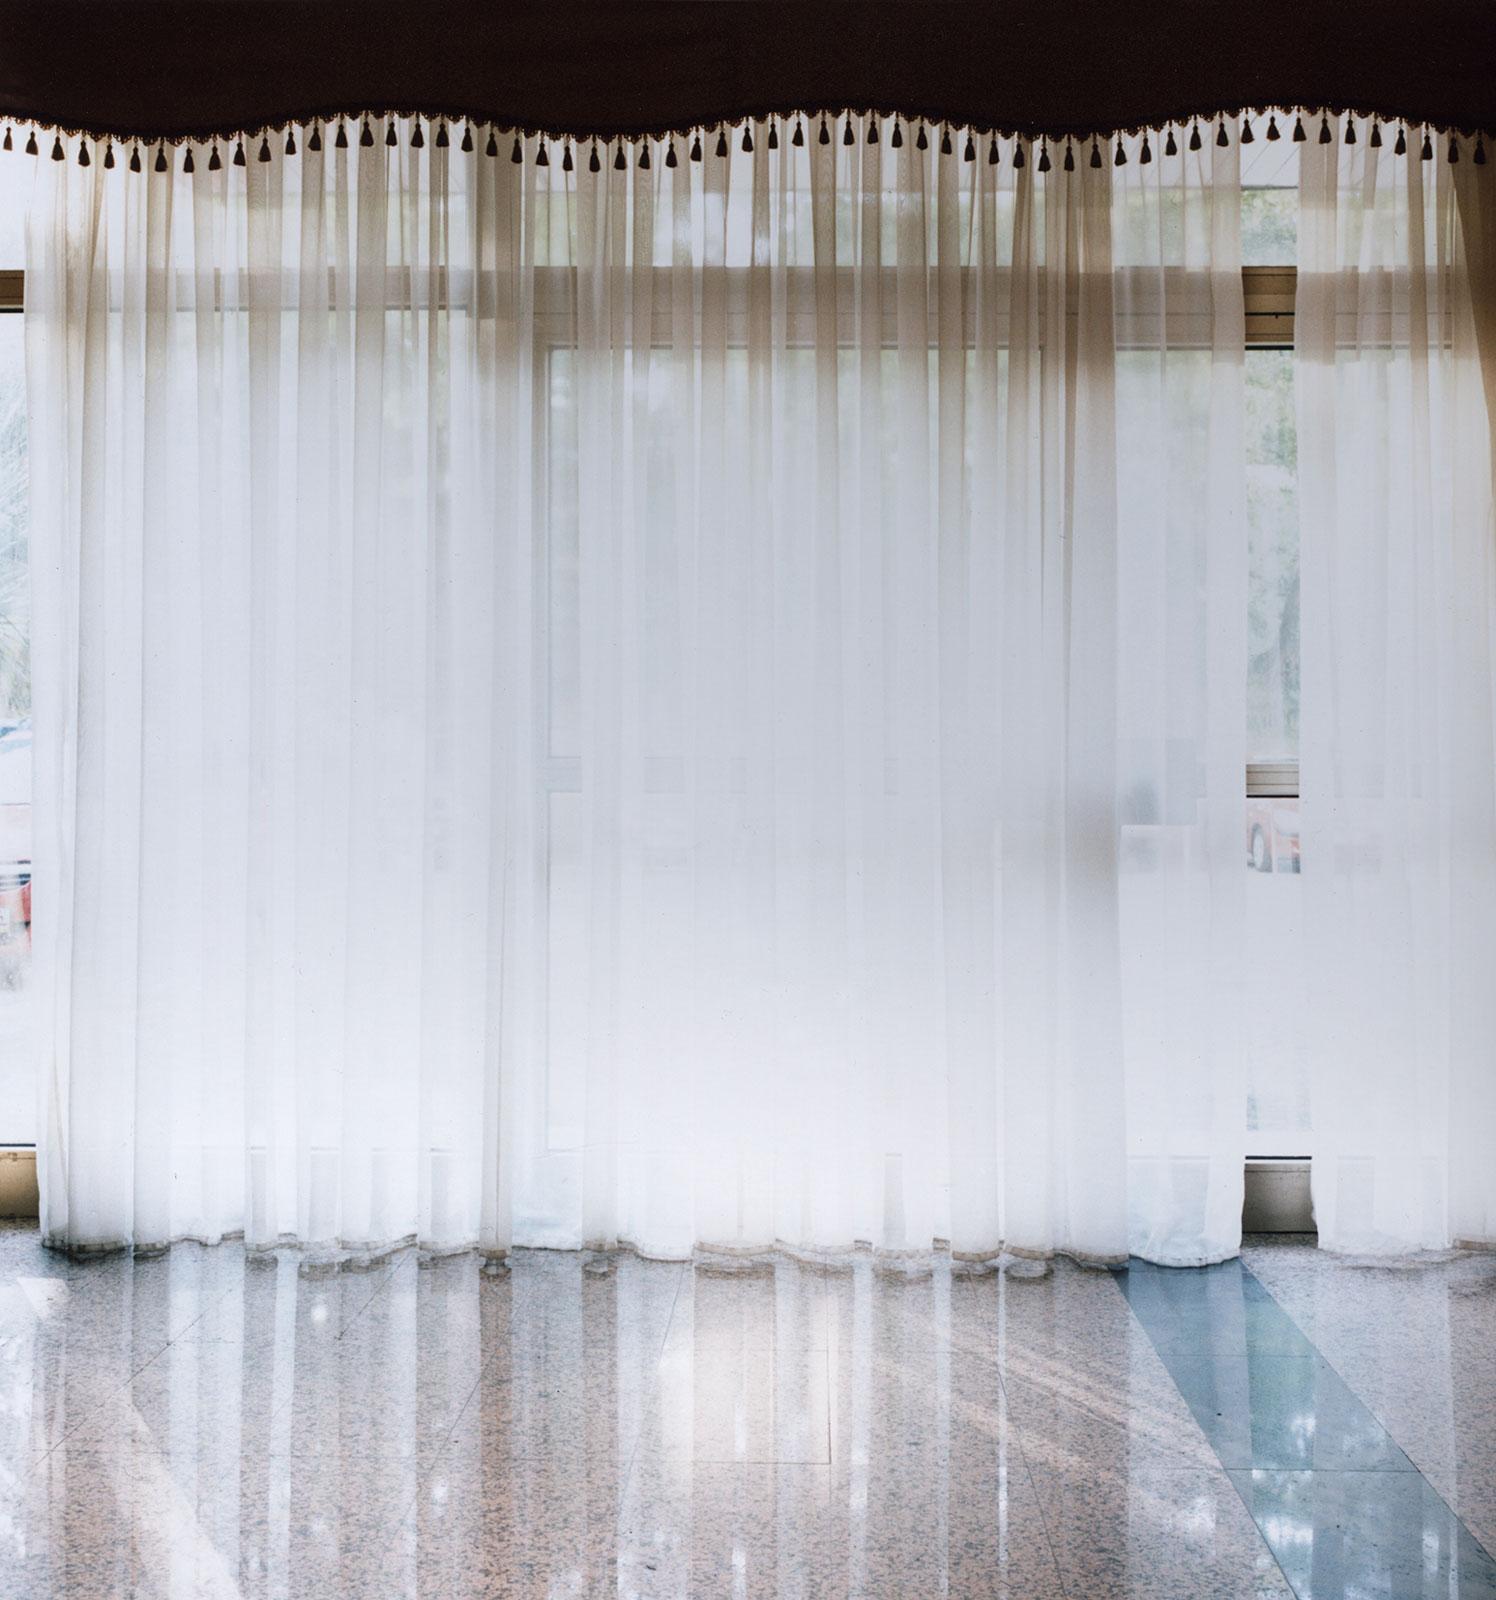 Curtains, 2014/2016, C-print, 100 x 100 cm, ed. 5